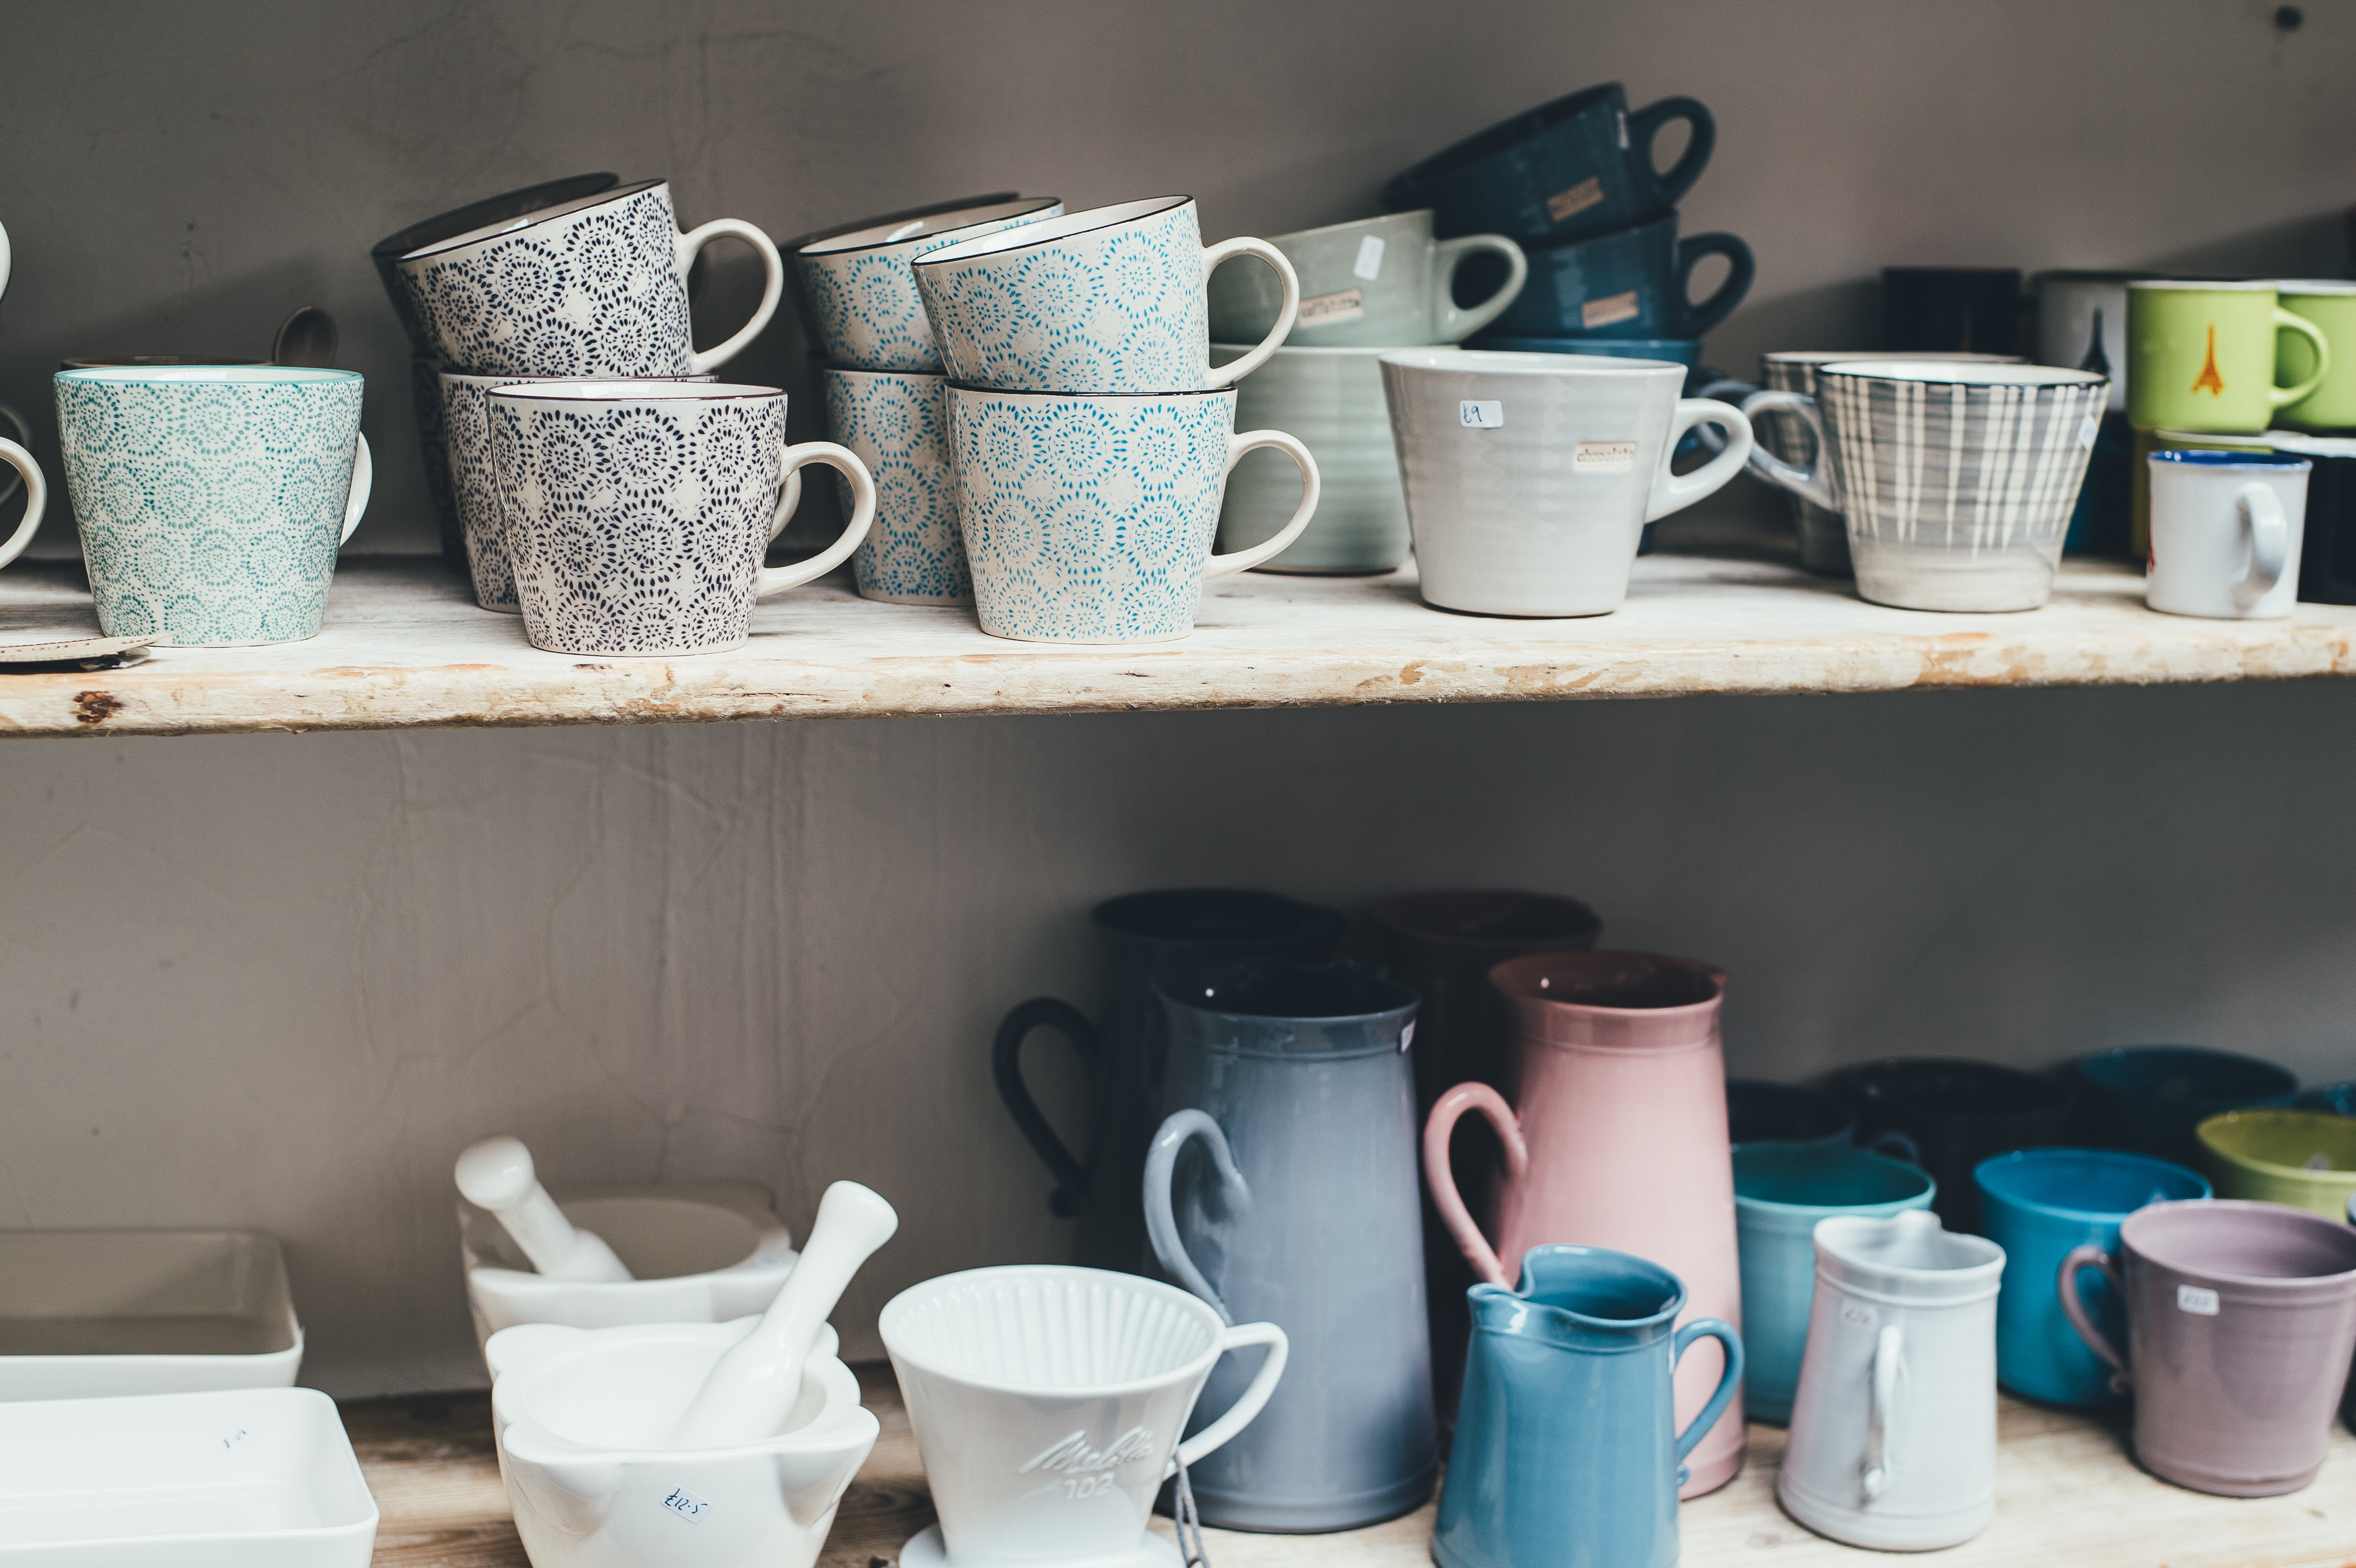 white ceramic mortar and pestle